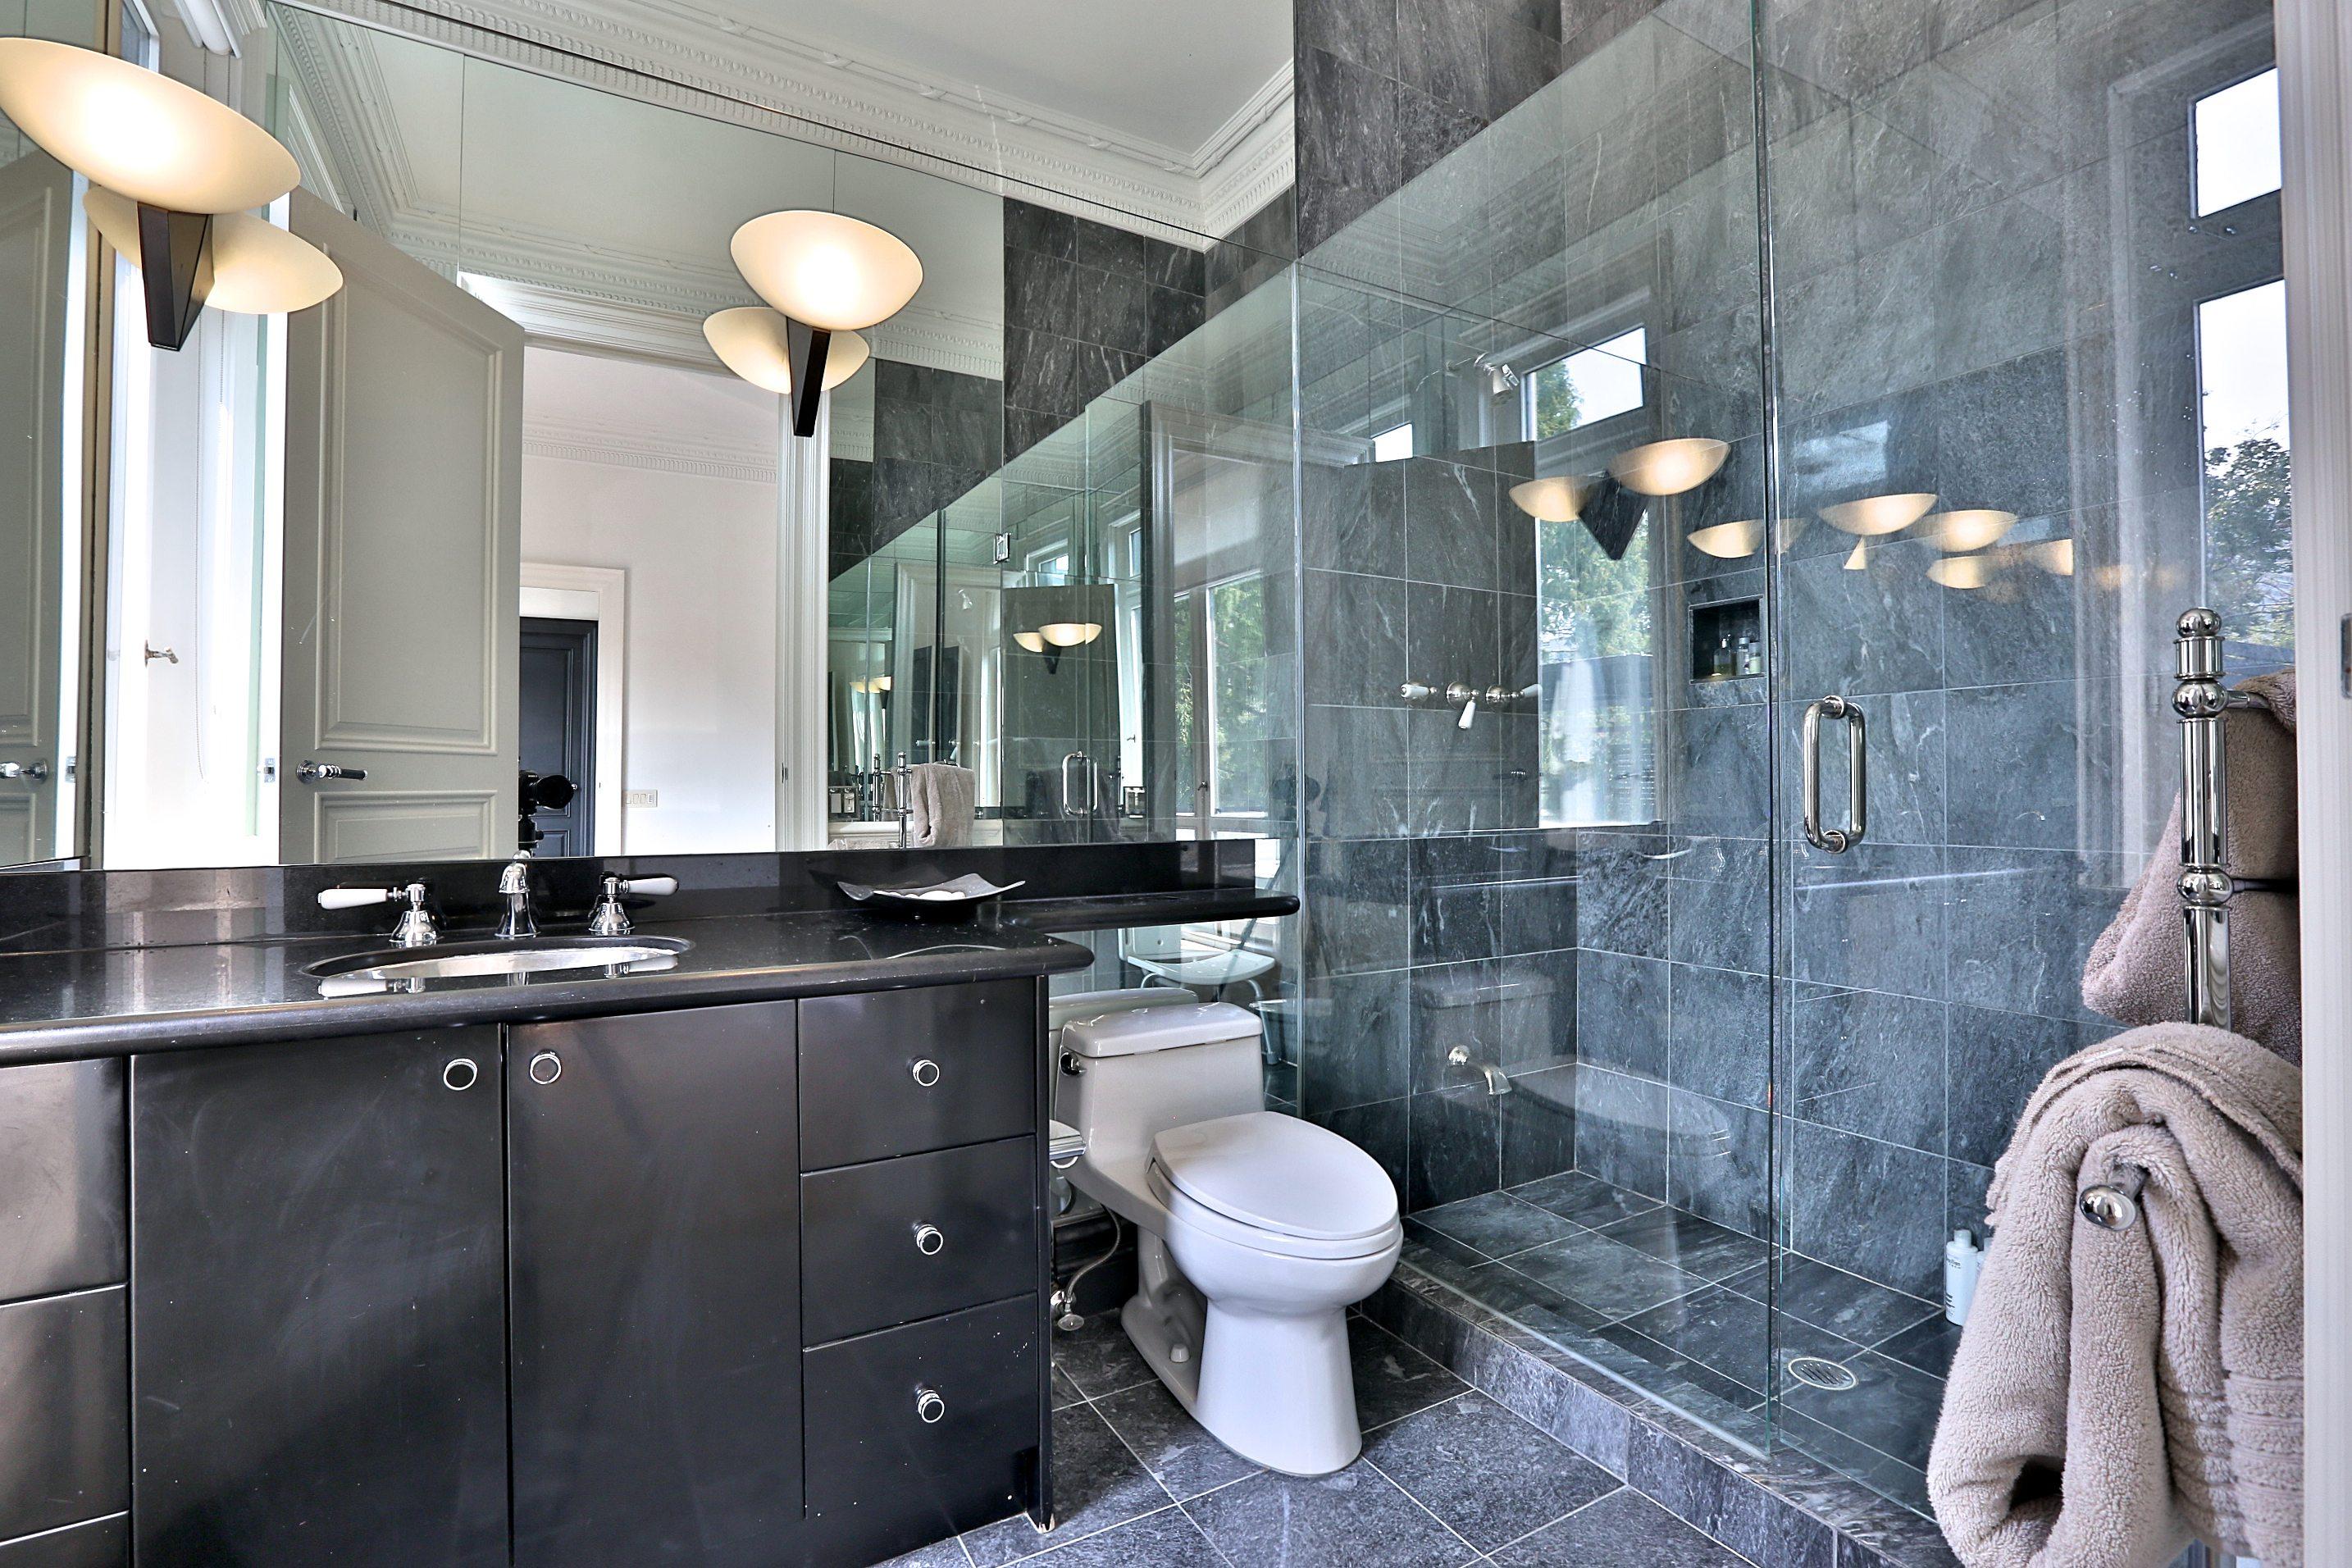 toronto-house-for-sale-7-sherwood-lane-13